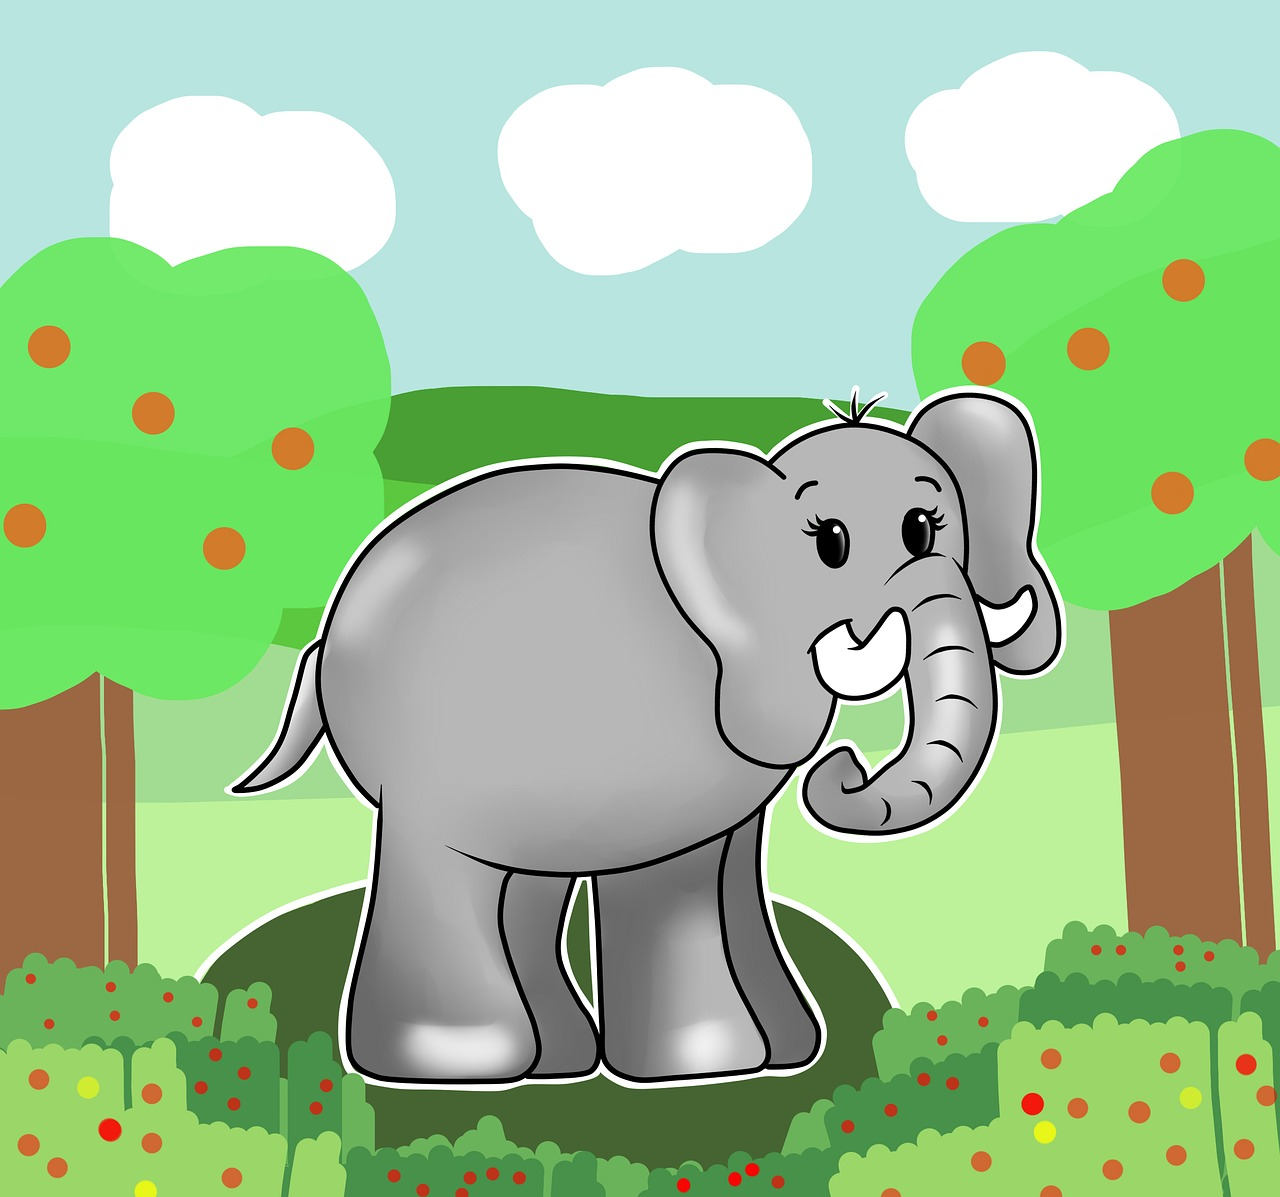 тех, картинки рисунки слоники история одного